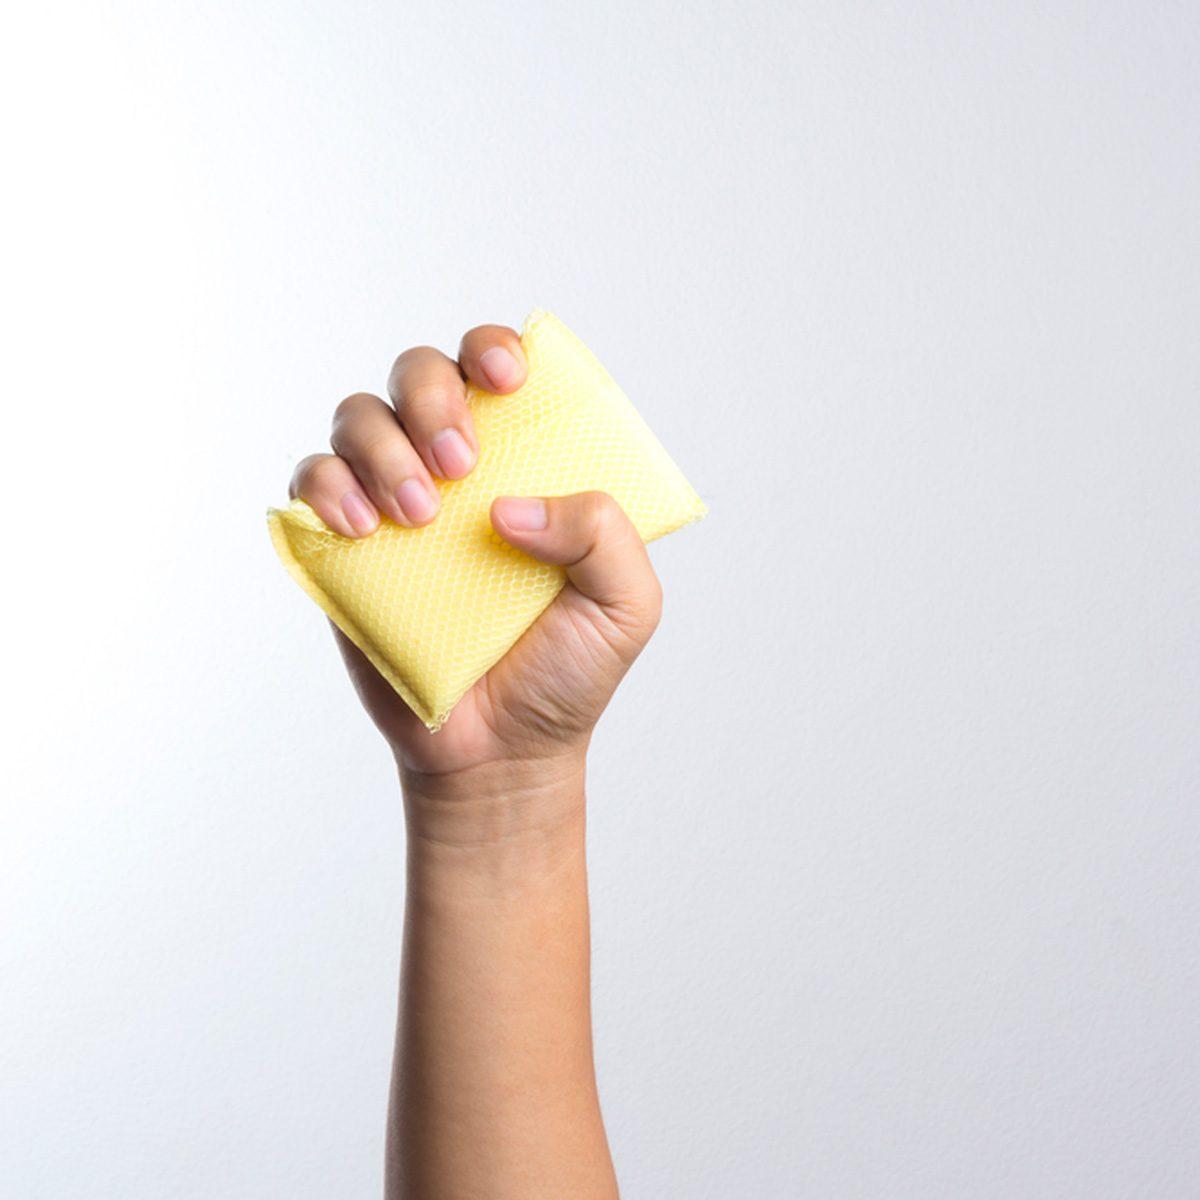 hand holding kitchen sponge